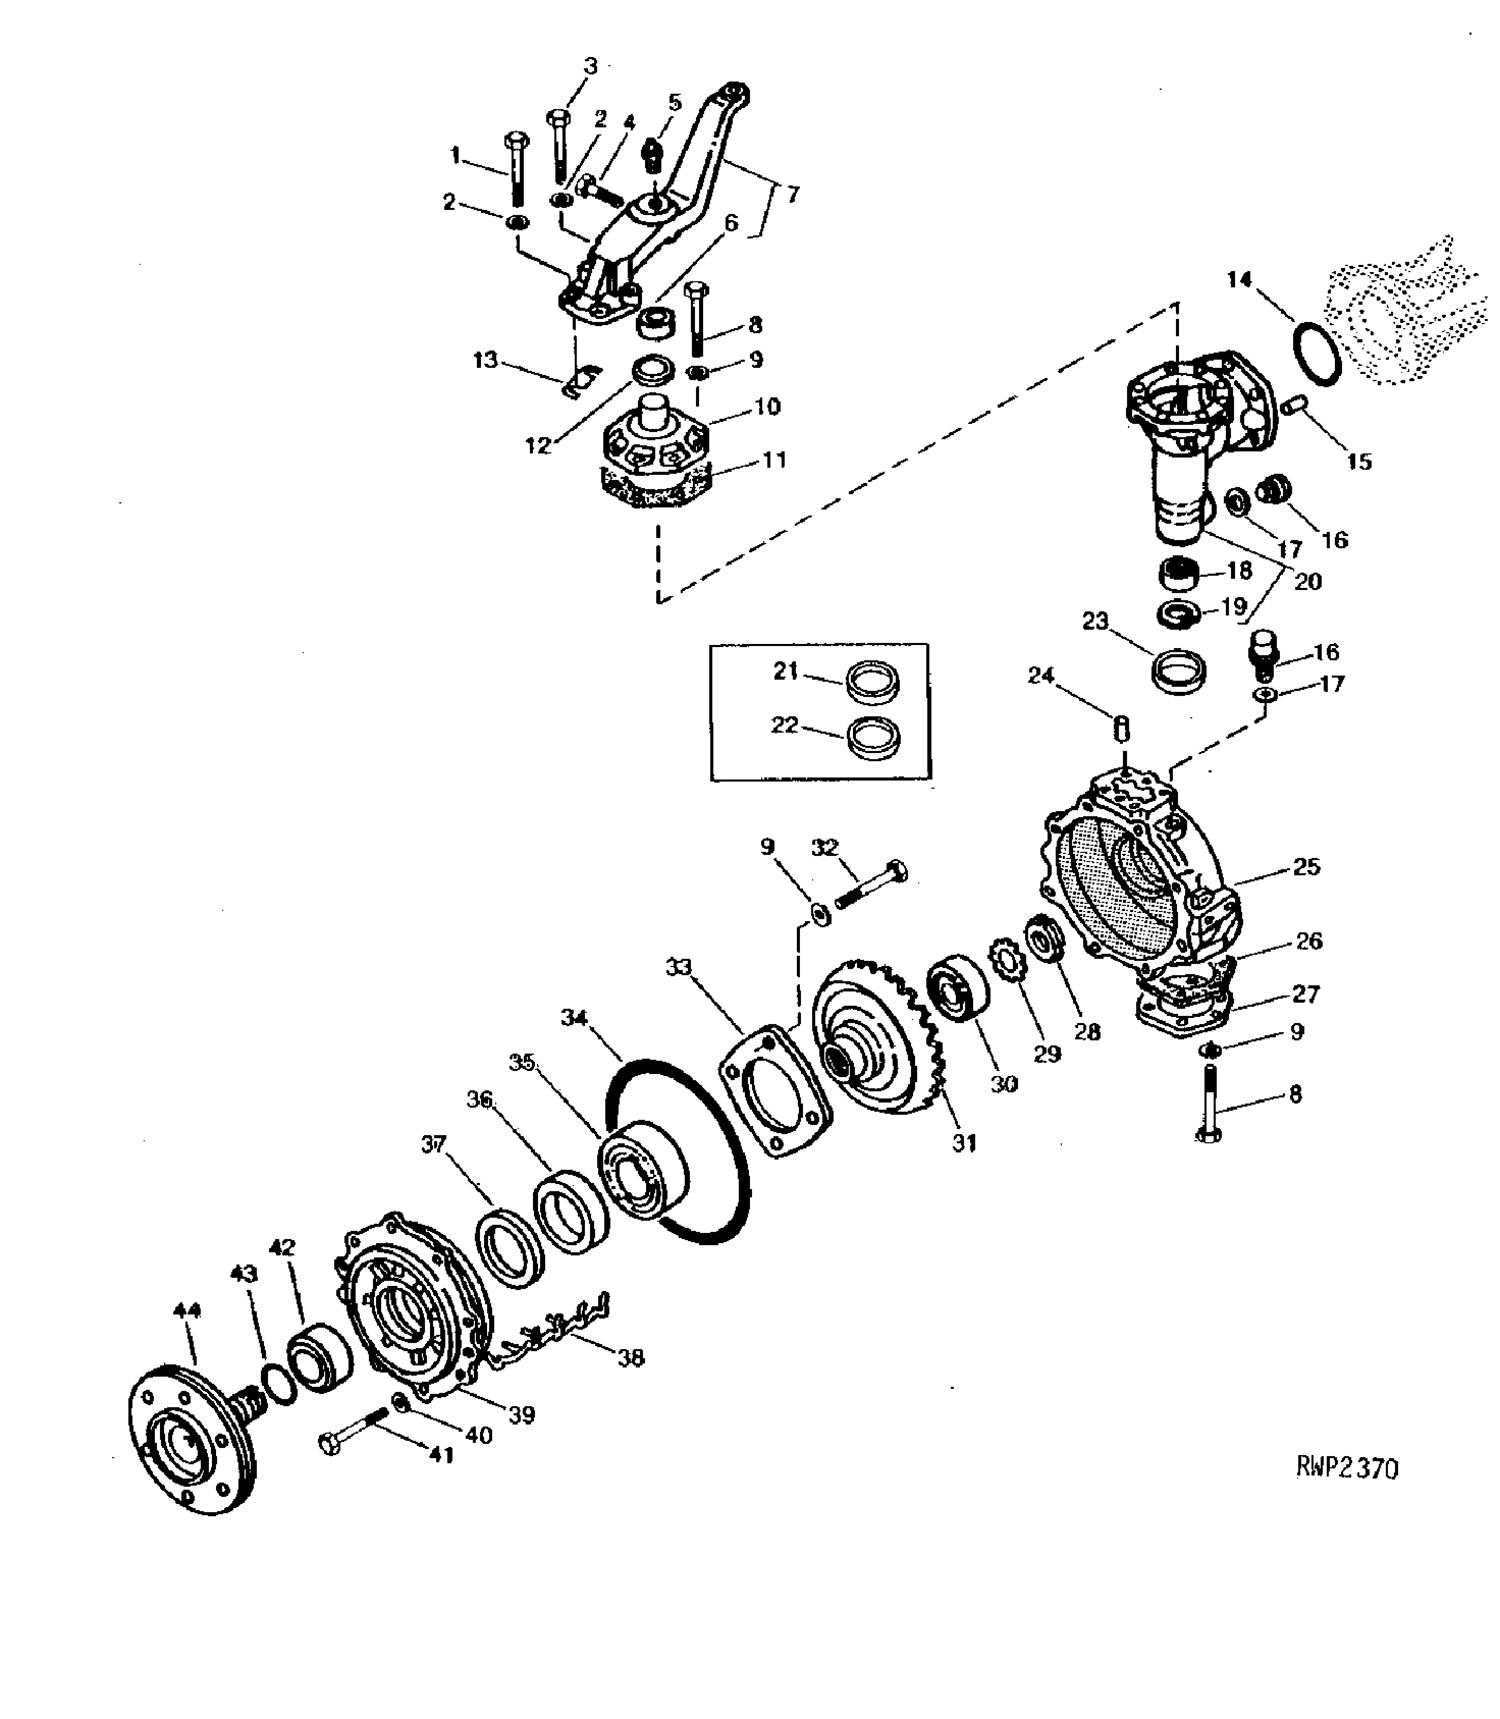 John Deere 950 Parts Diagram John Deere 830 Parts Diagram